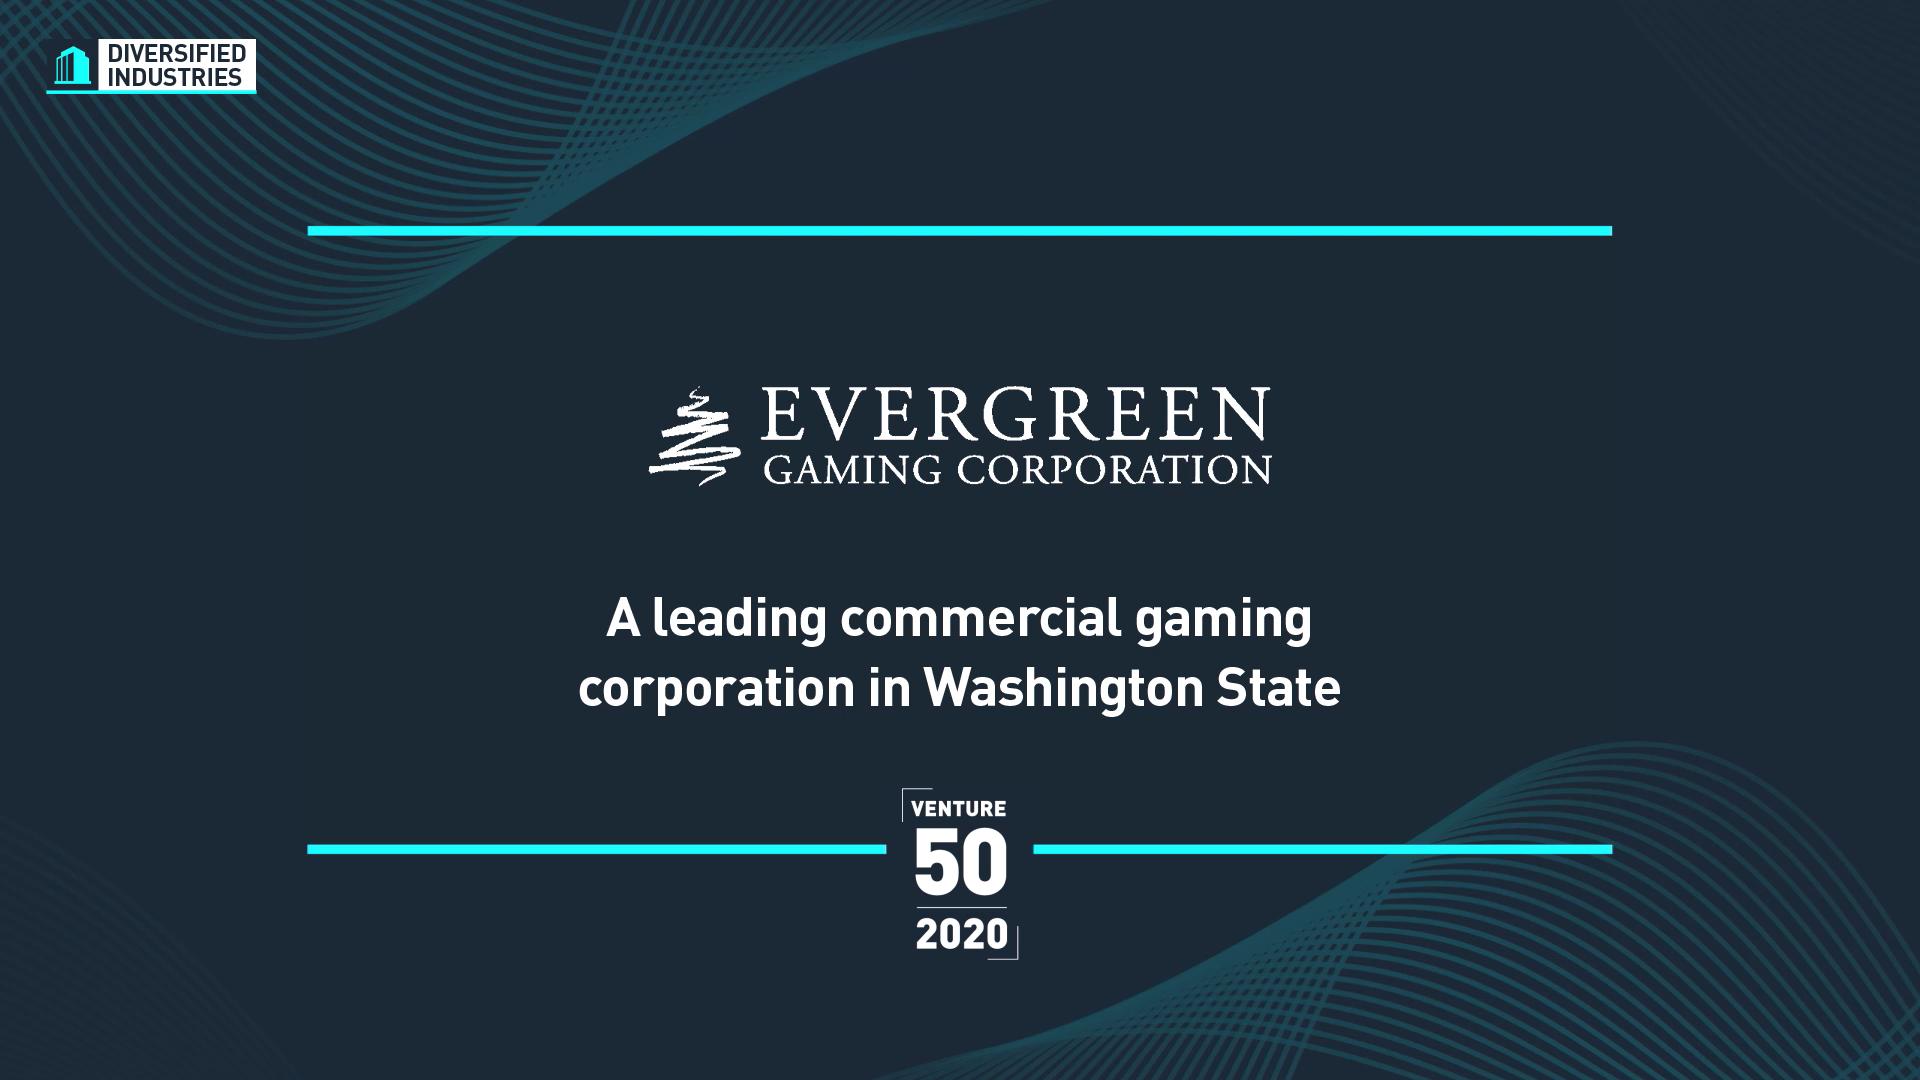 Evergreen Gaming Corporation